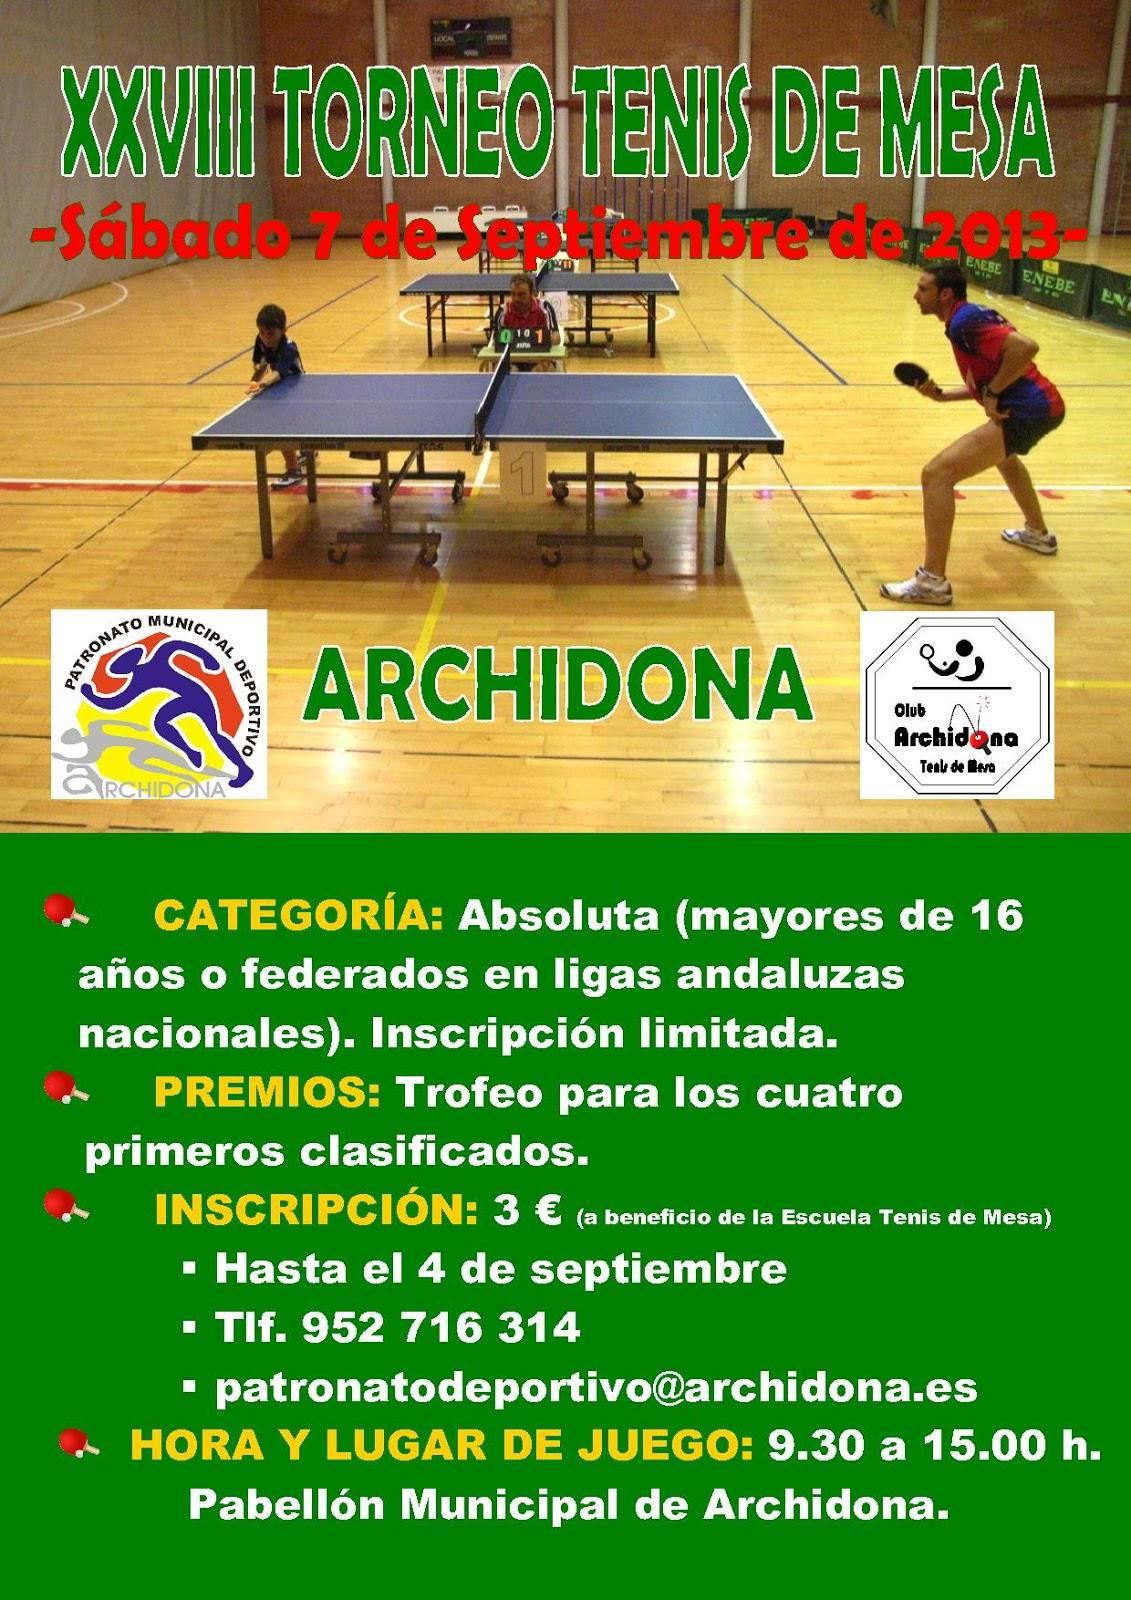 Patronato municipal deportivo de archidona torneo de tenis de mesa - Torneo tenis de mesa ...